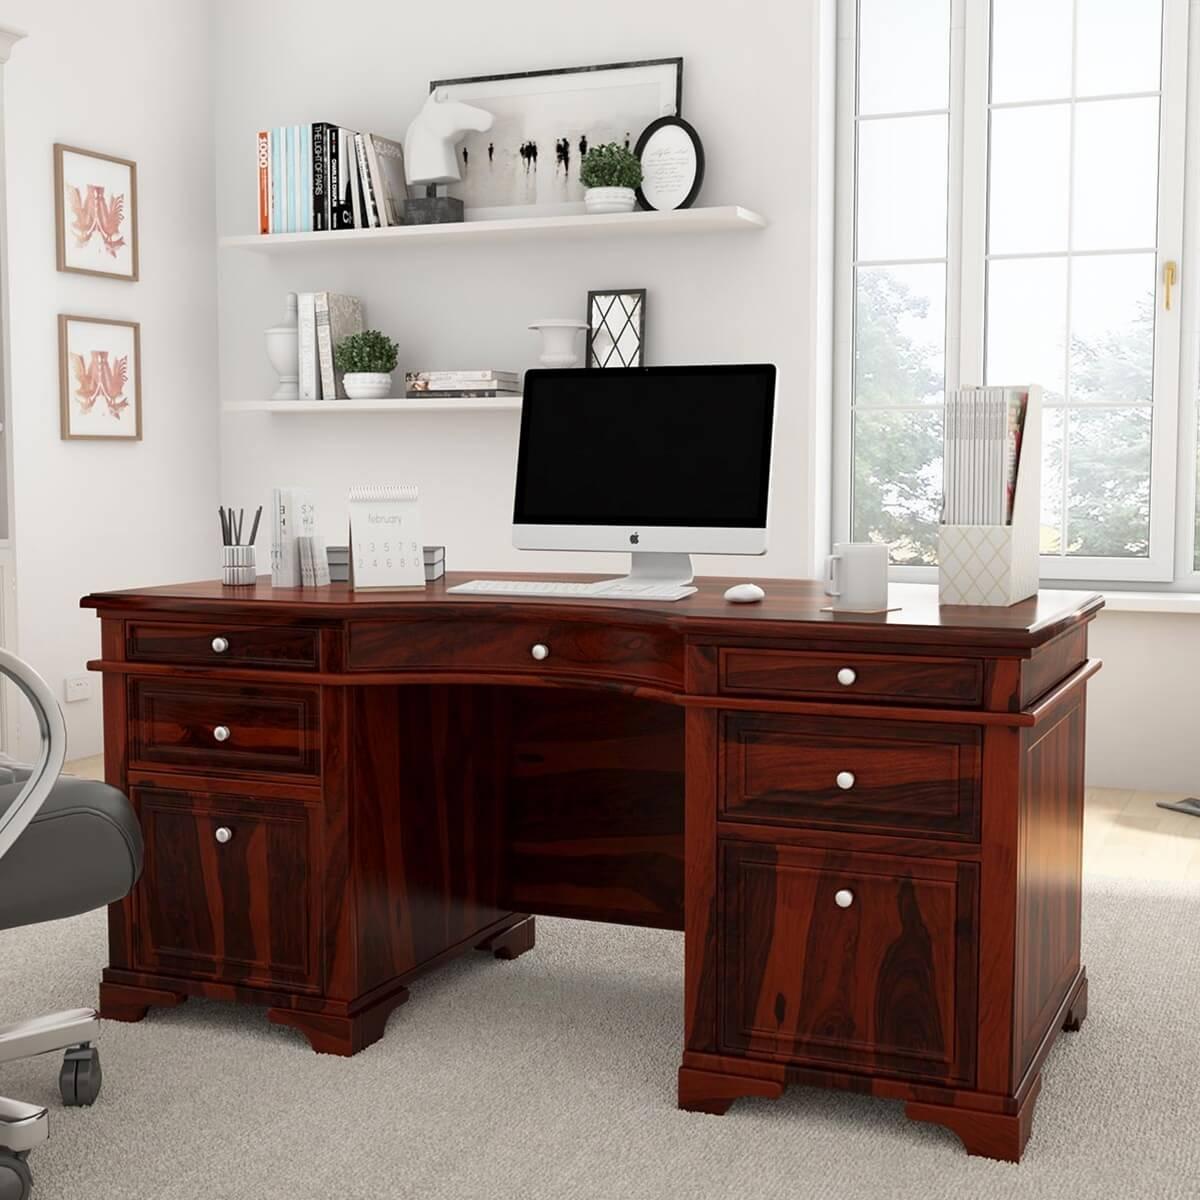 Rustic Americana Hardwood Executive Desk Home Office: Victorian Style Rustic Solid Wood Executive Desk